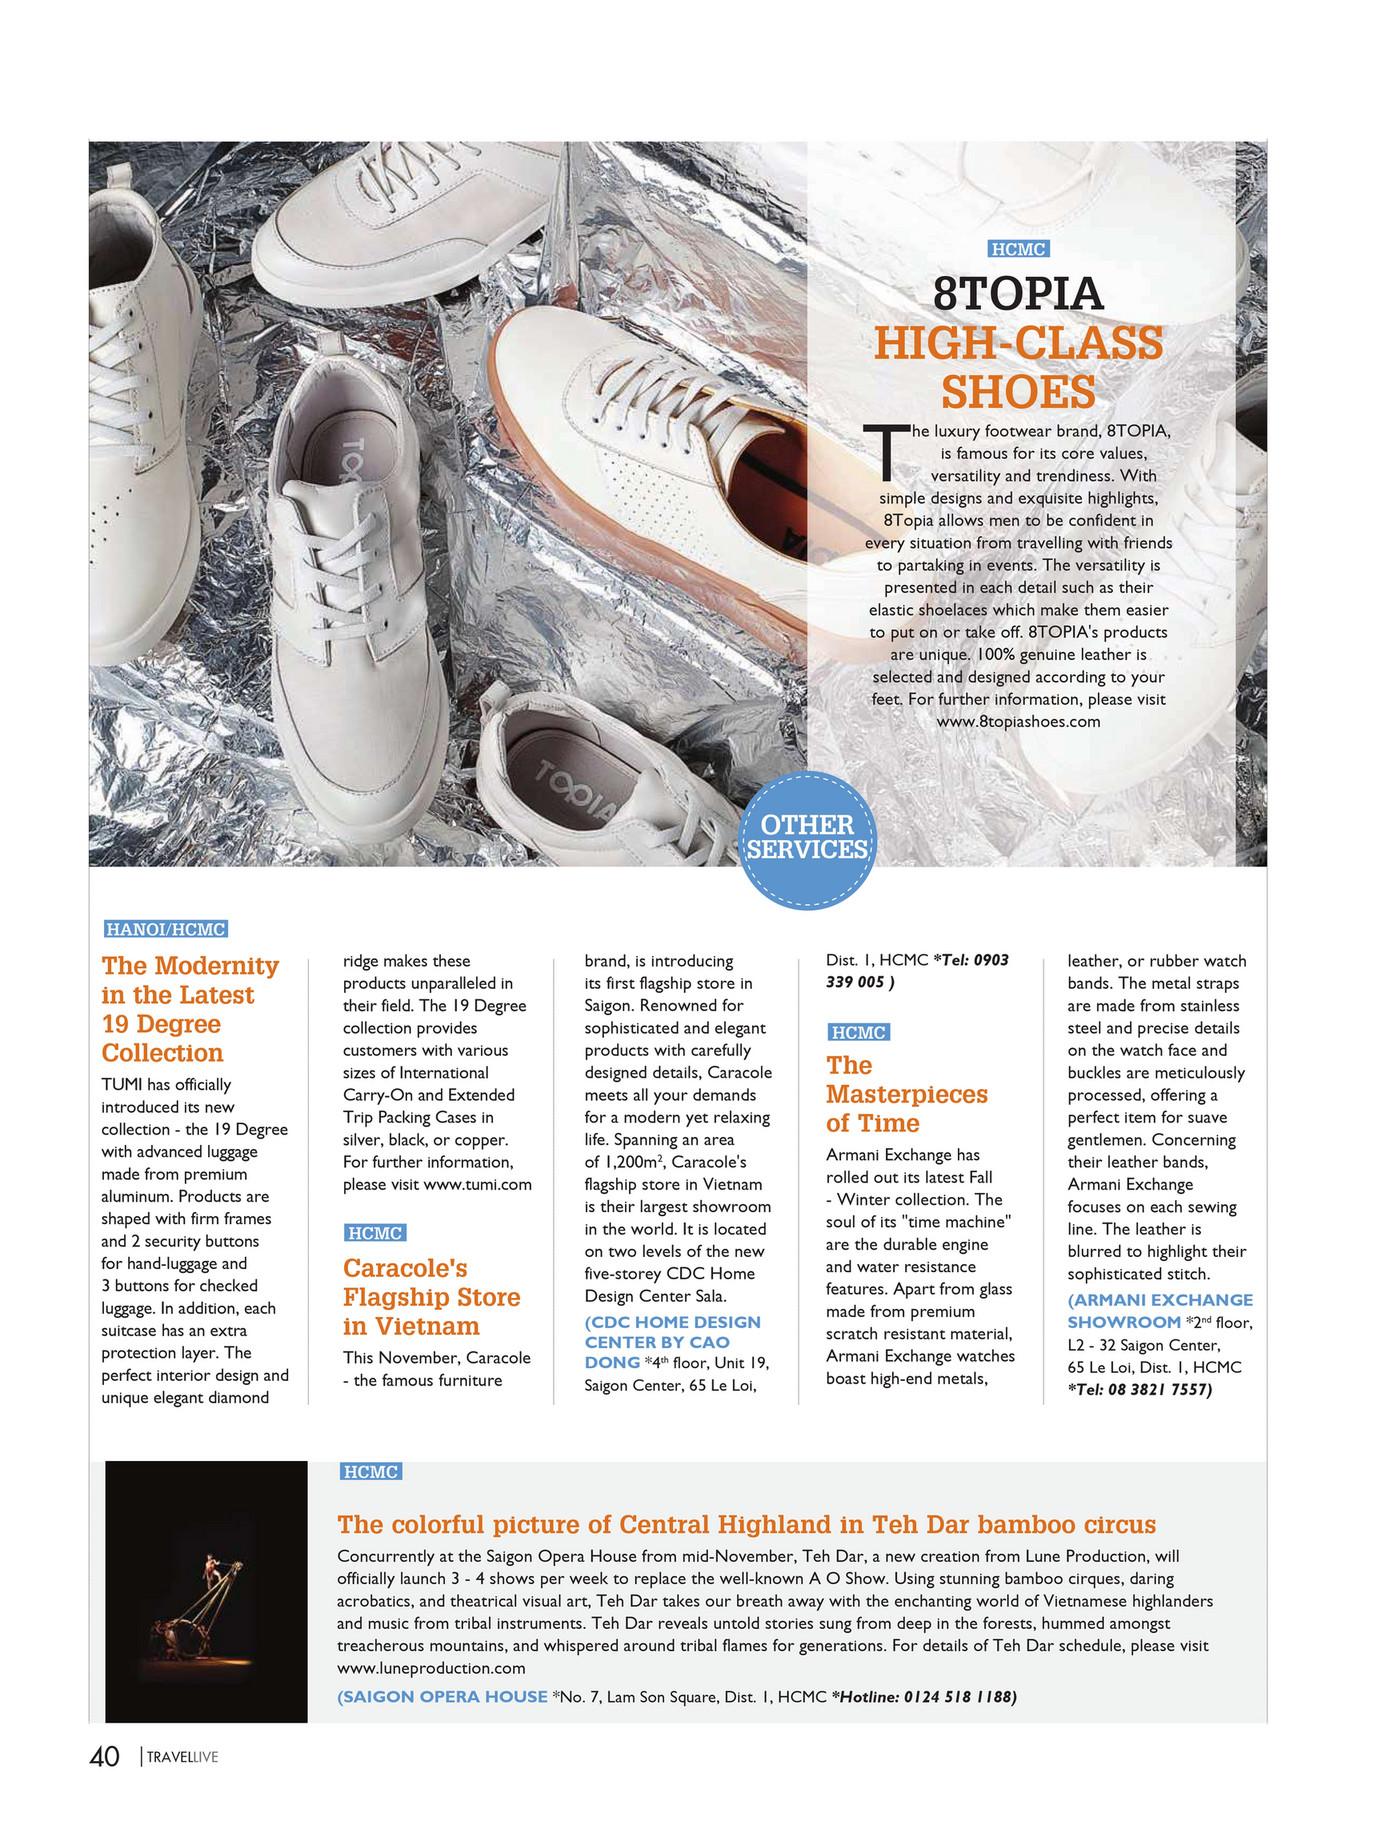 travellive magazine travellive 11 2016 page 40 41 created travellive